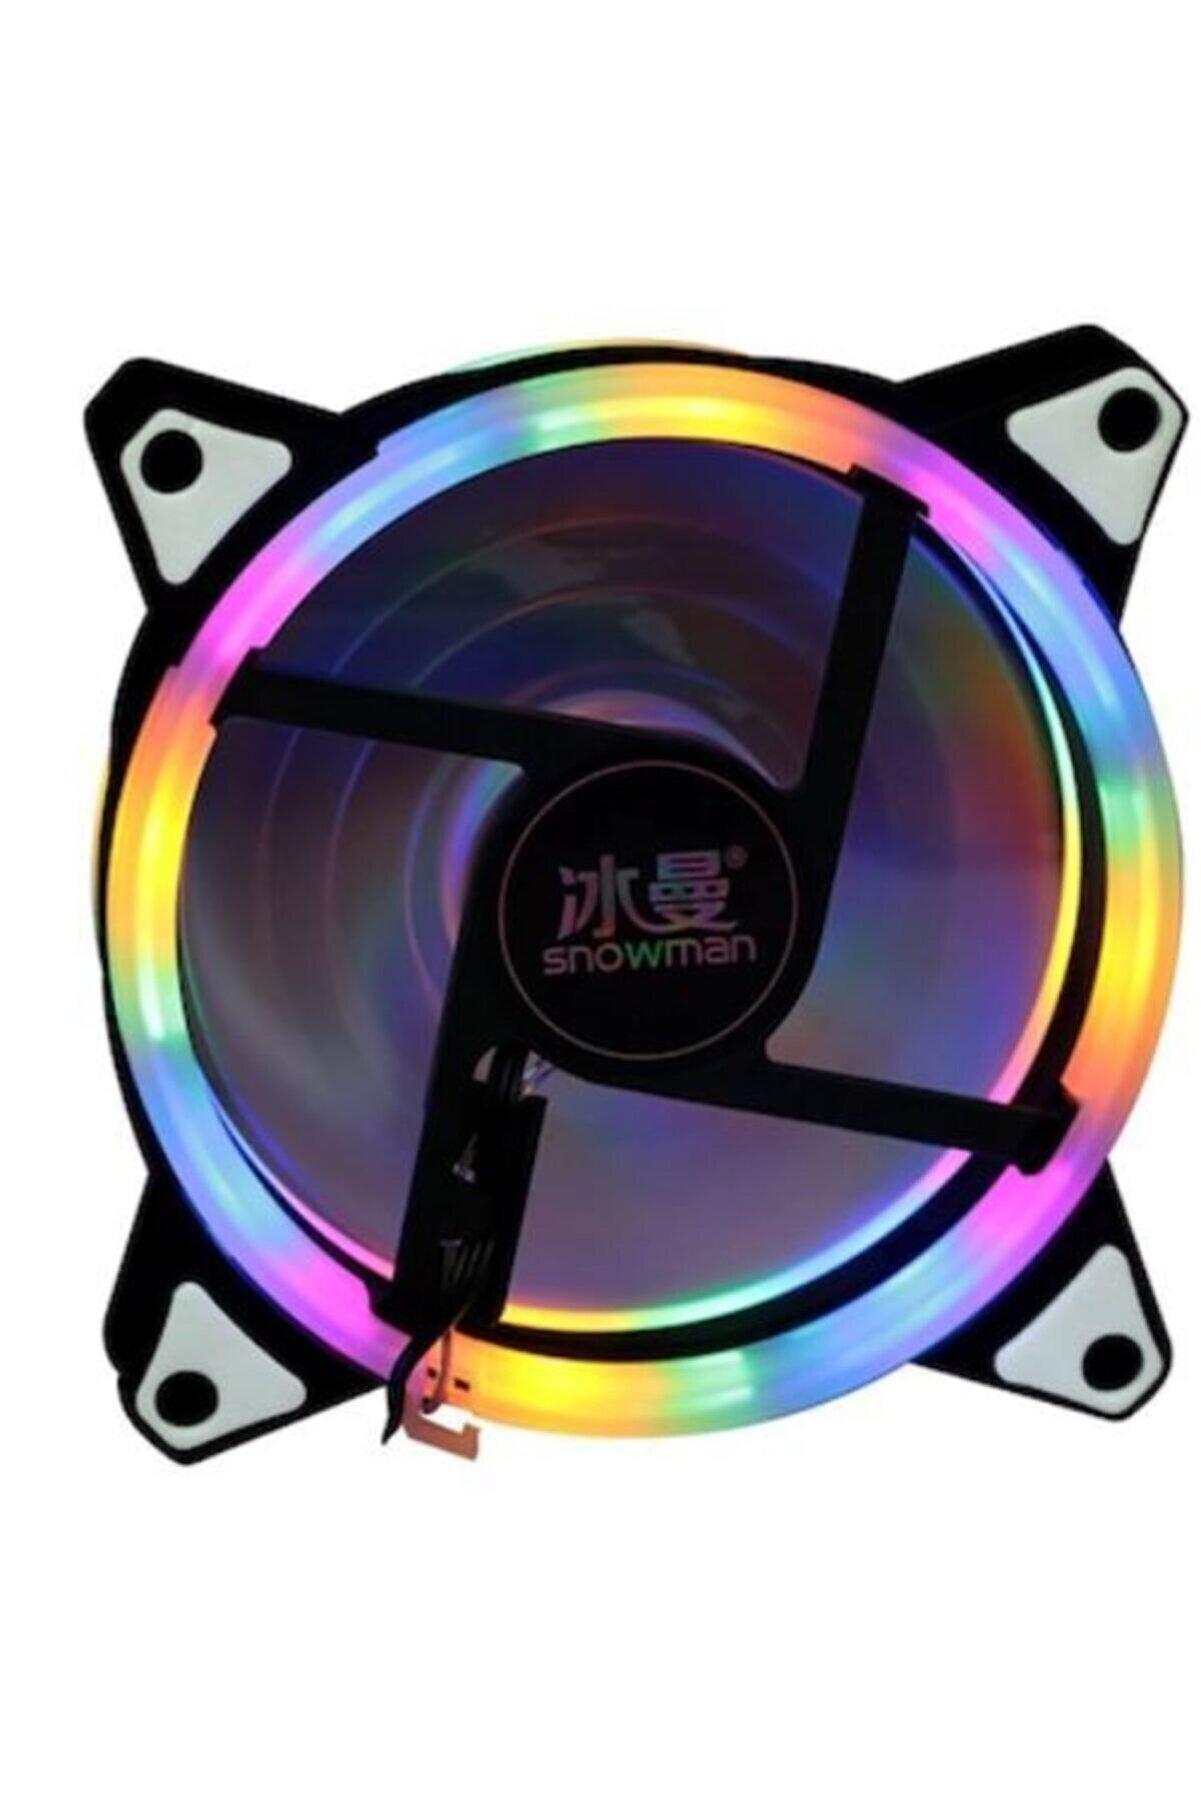 BTS Teknoloji Snowman 12cm Rgb 3 Renk Rainbow Kasa Geniş Fan